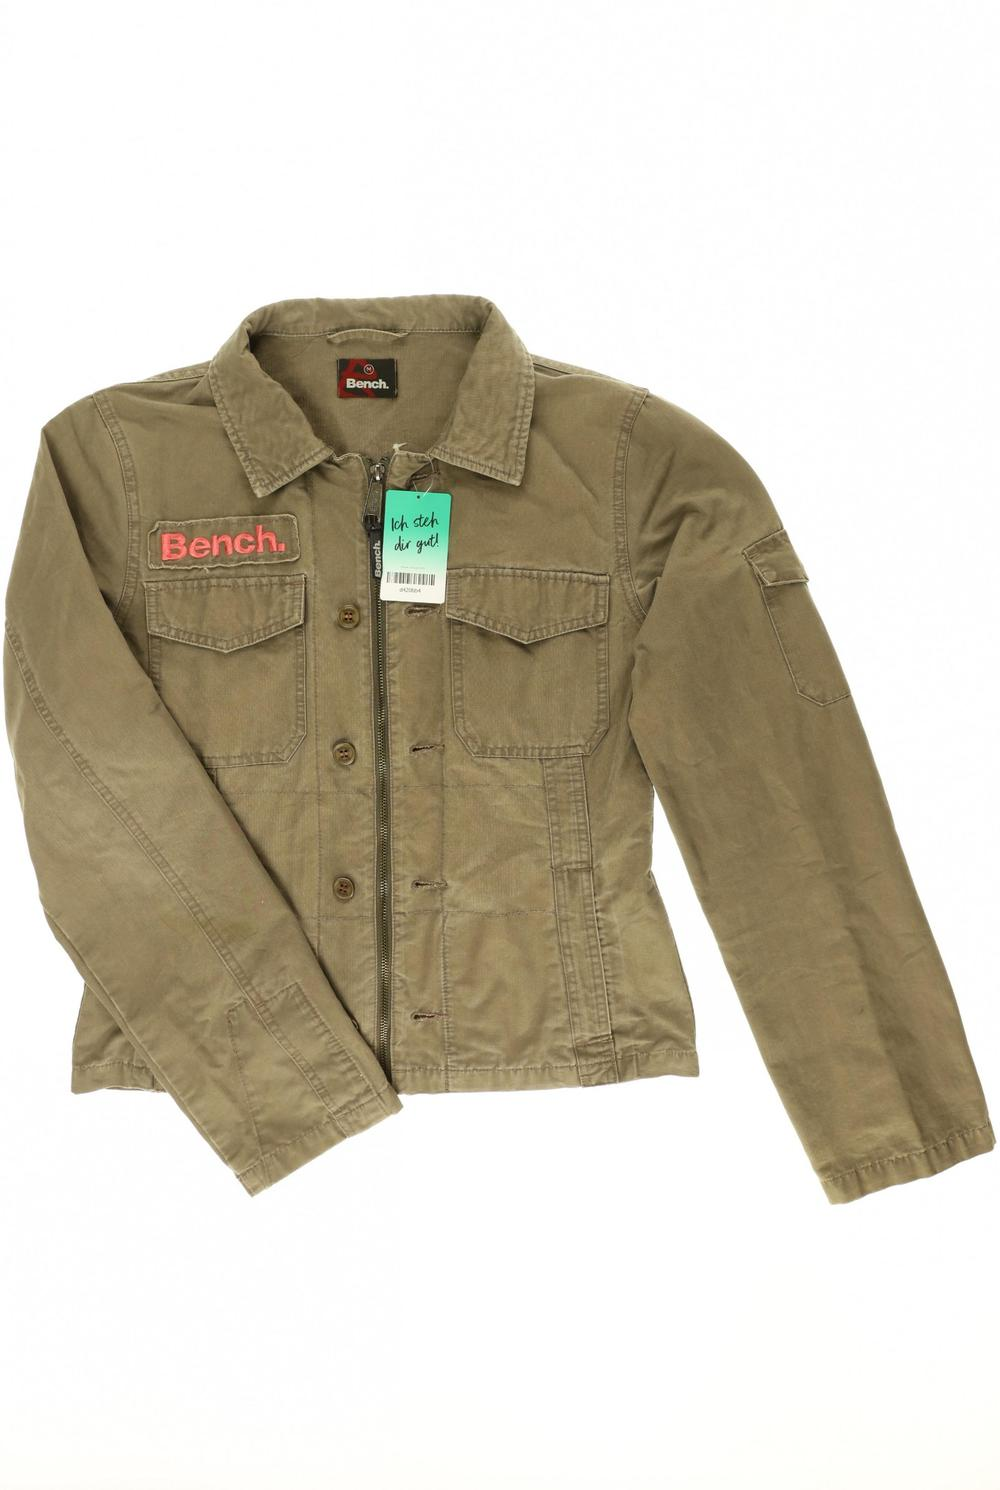 Bench. Damen Jacke INT M Second Hand kaufen | ubup